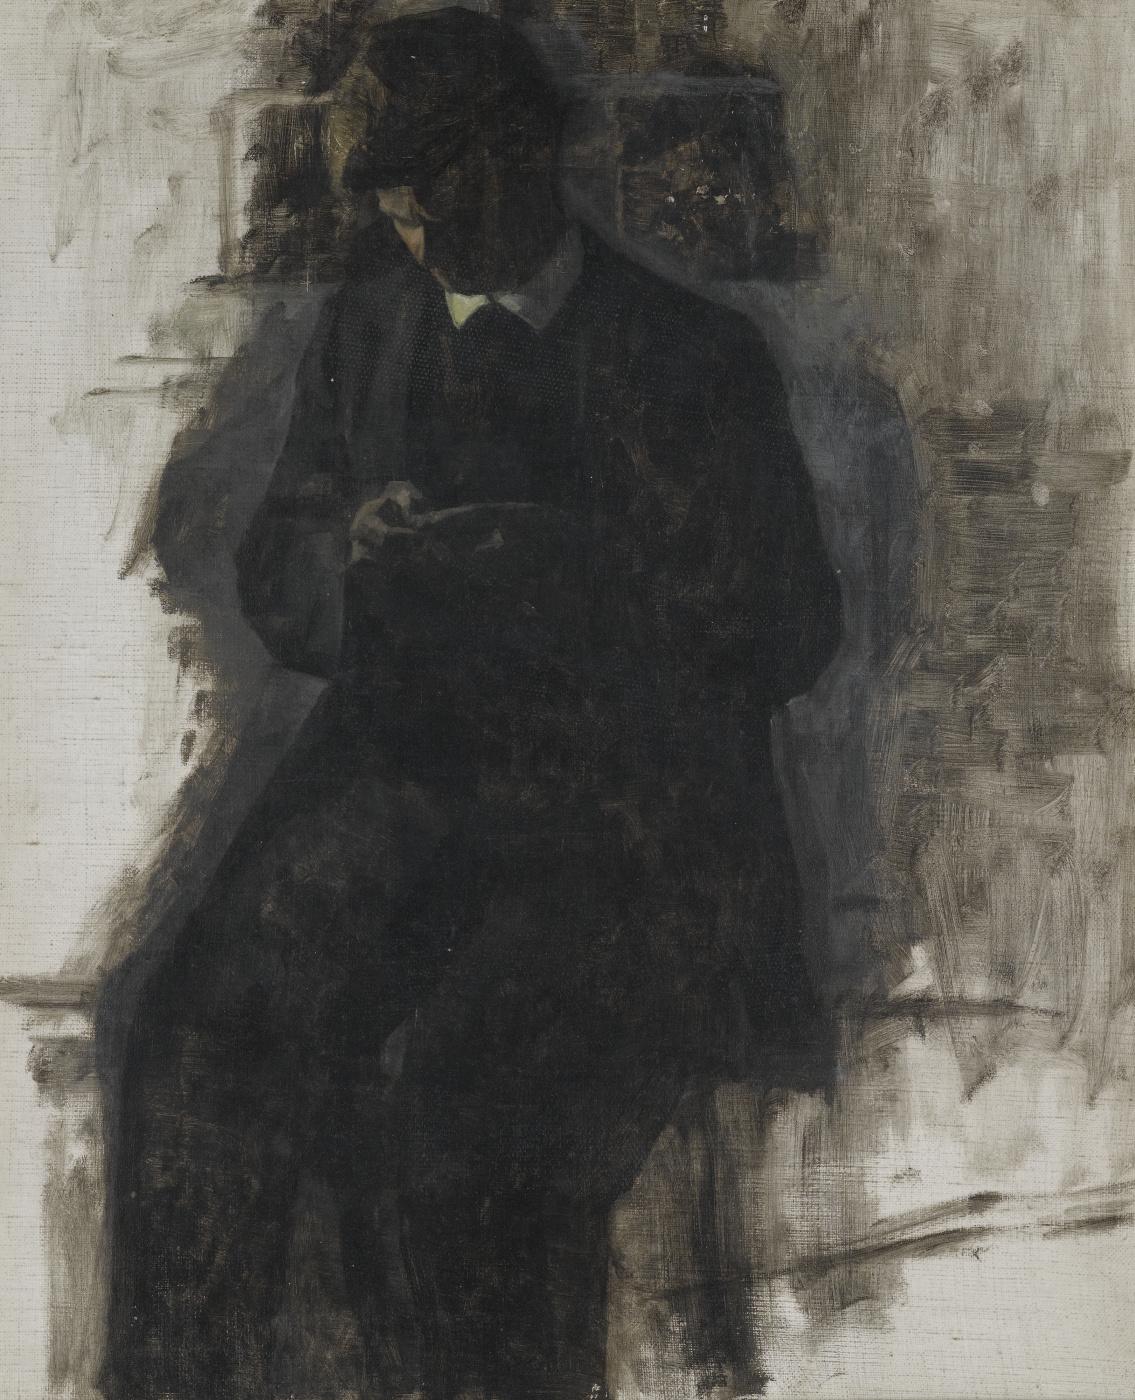 Vilhelm Hammershøi. Numismatist (Portrait of Sven, the artist's brother). Sketch